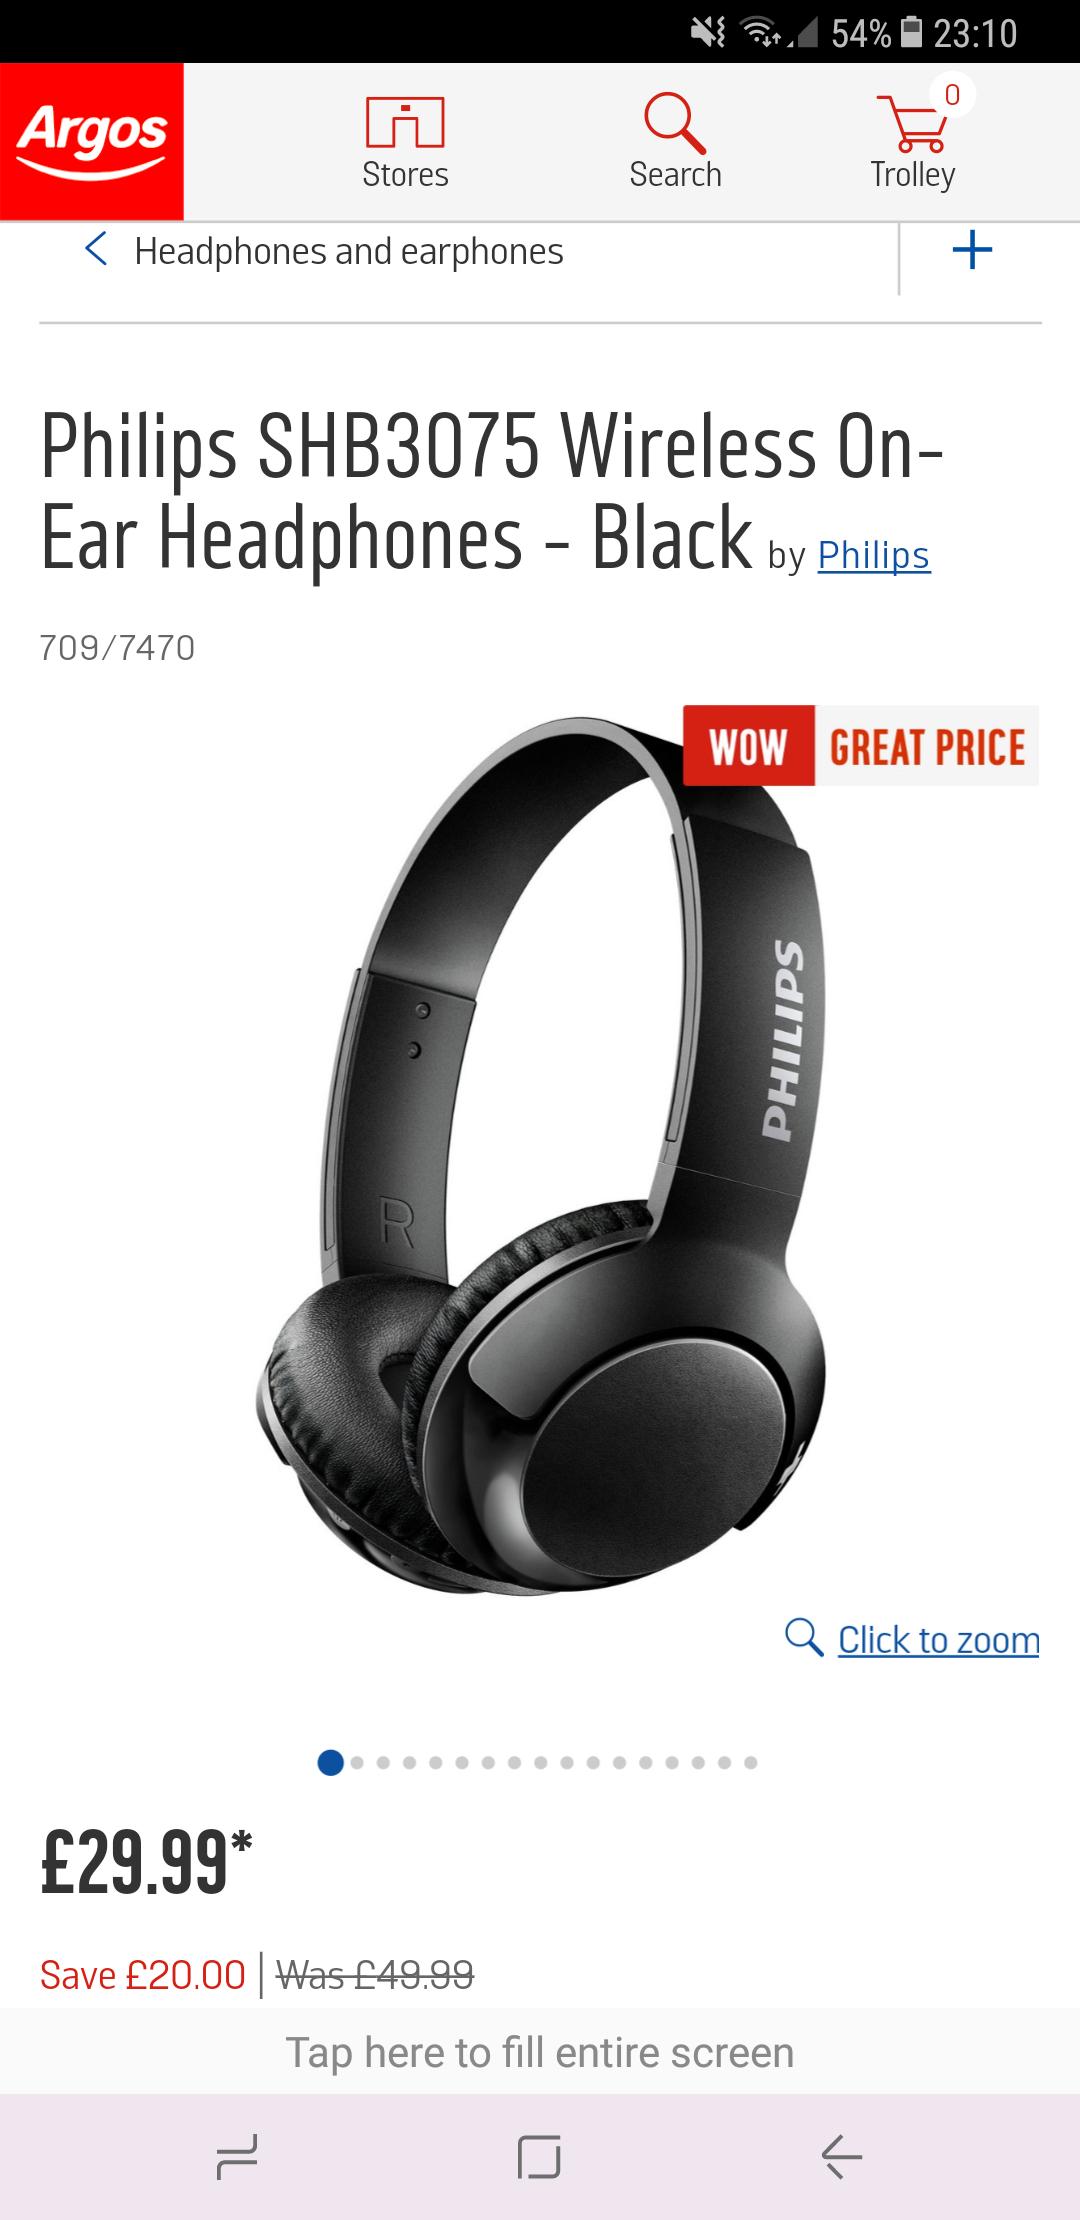 Philips SHB3075 Wireless On-Ear Headphones - £29.99 @ Argos